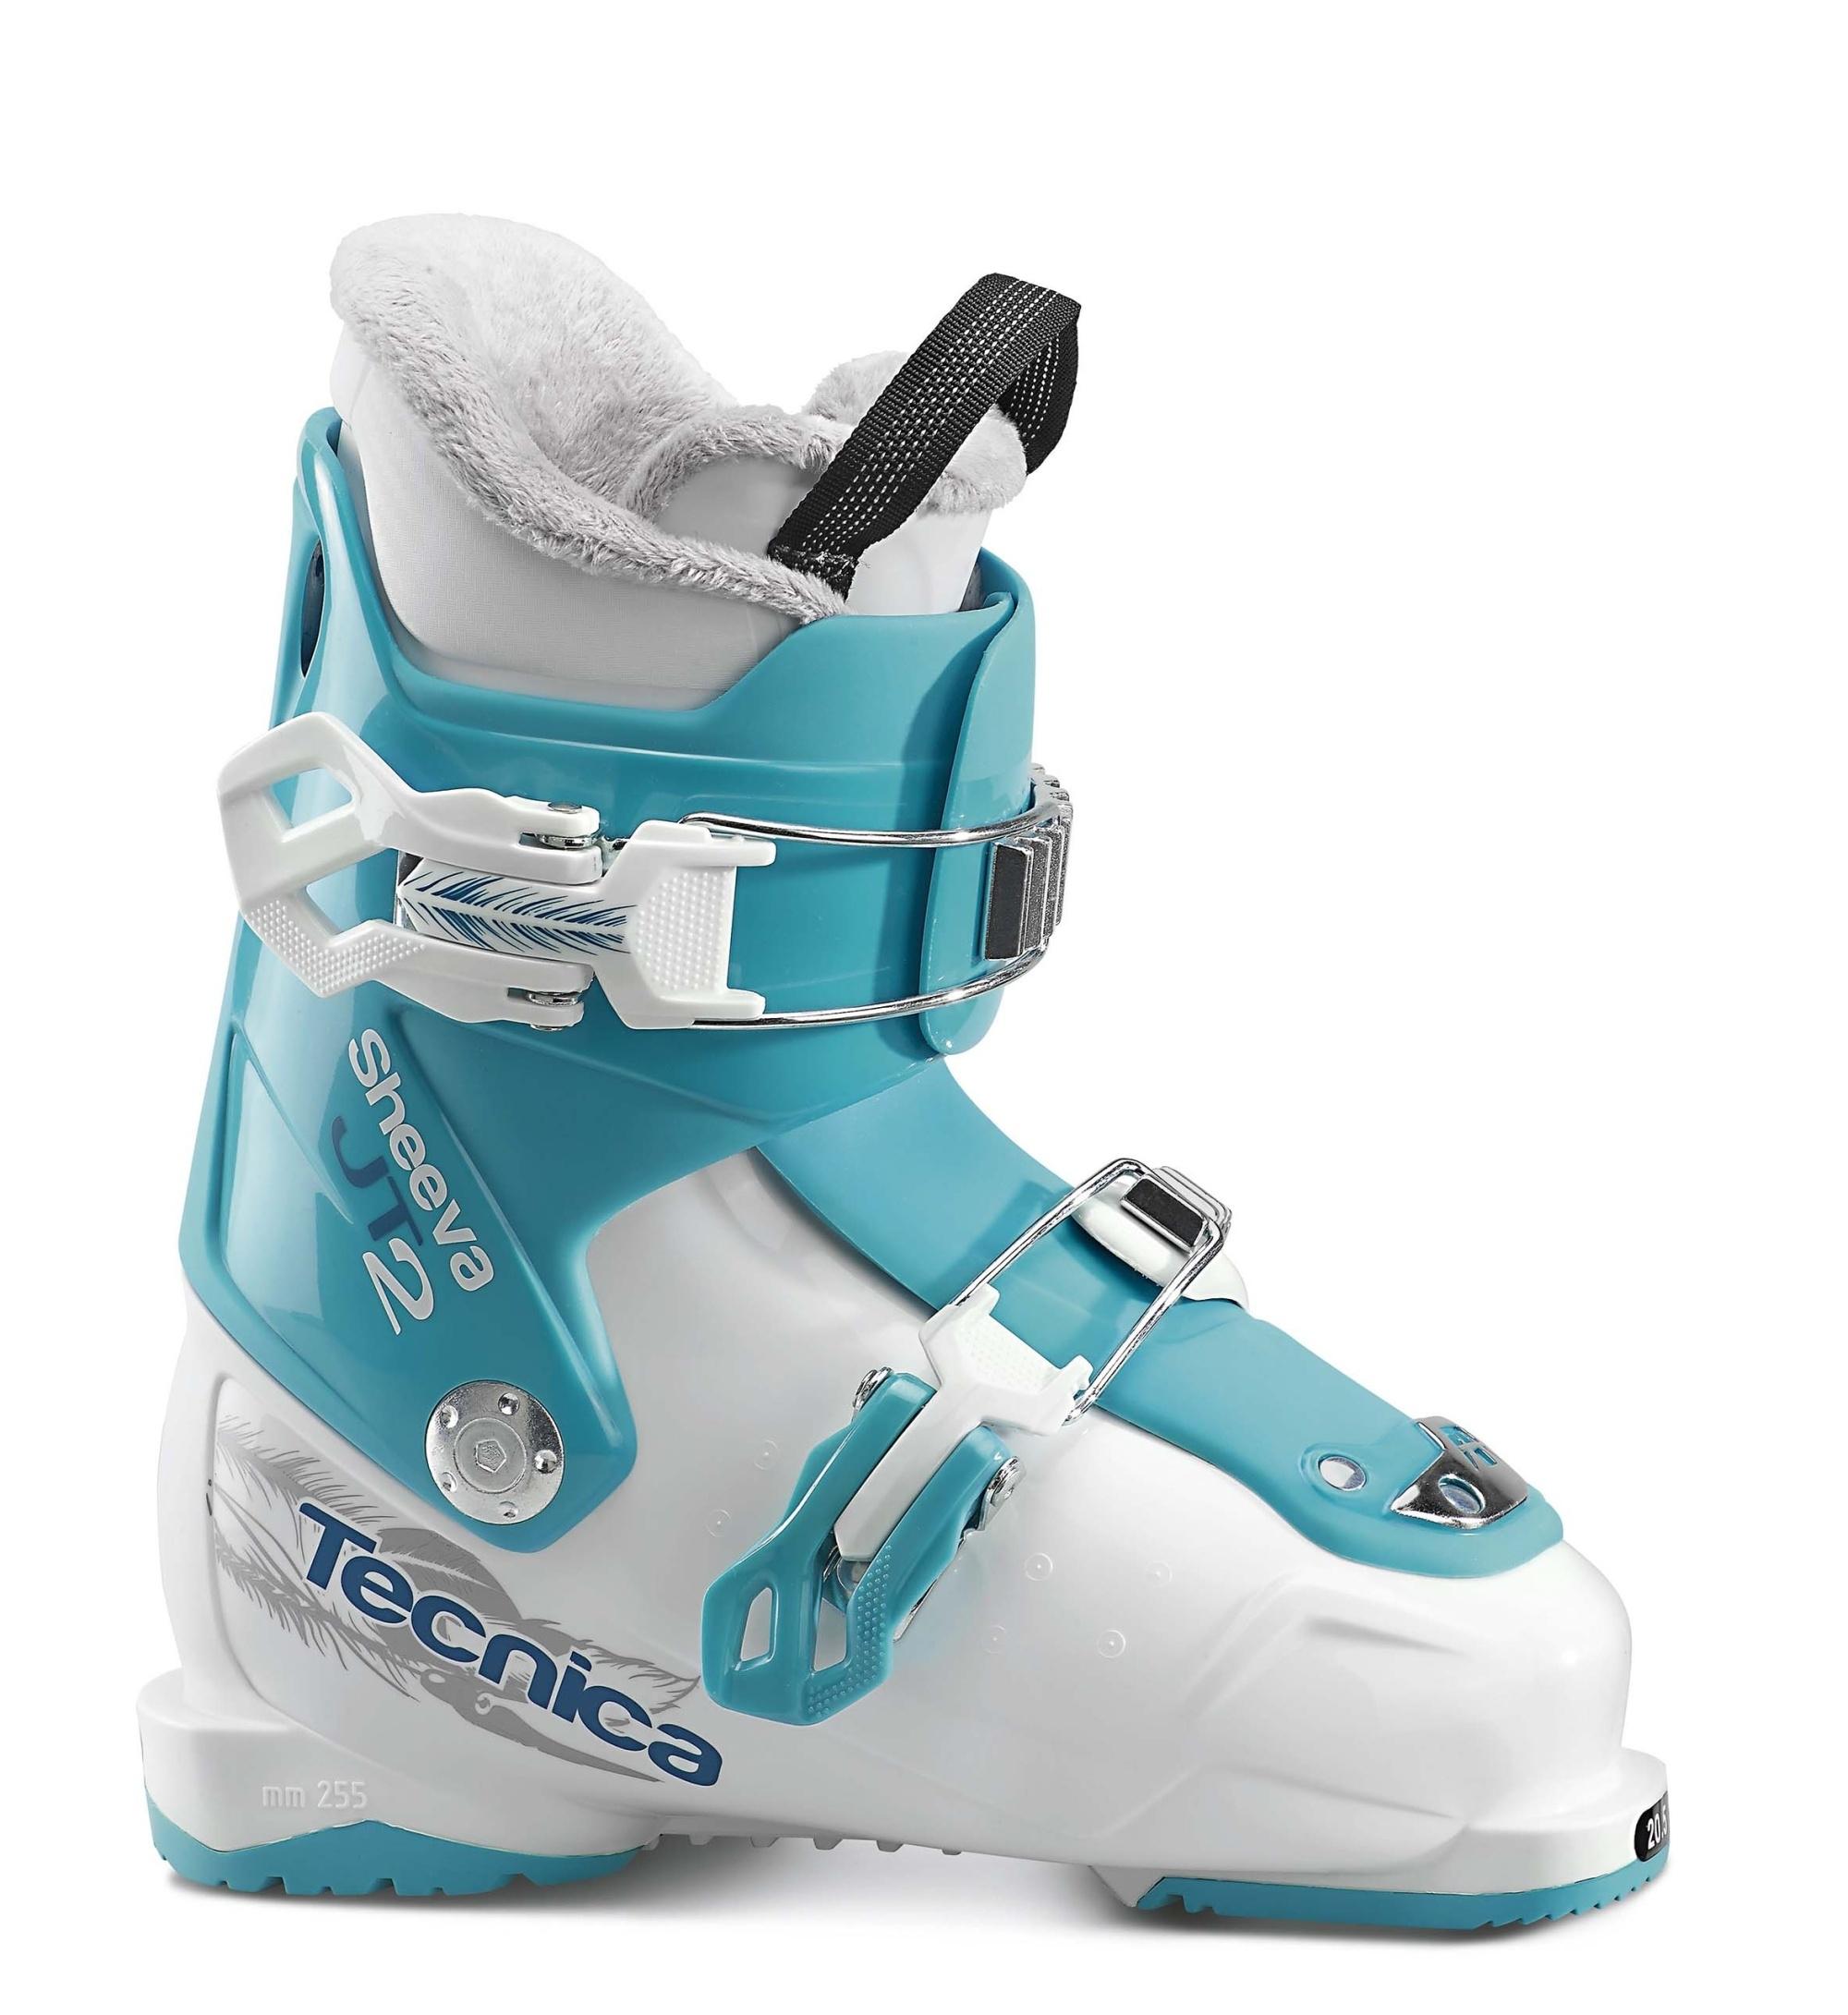 Lyžařské boty Tecnica JT 2 Sheeva Barva: Bílá, Velikost: 195